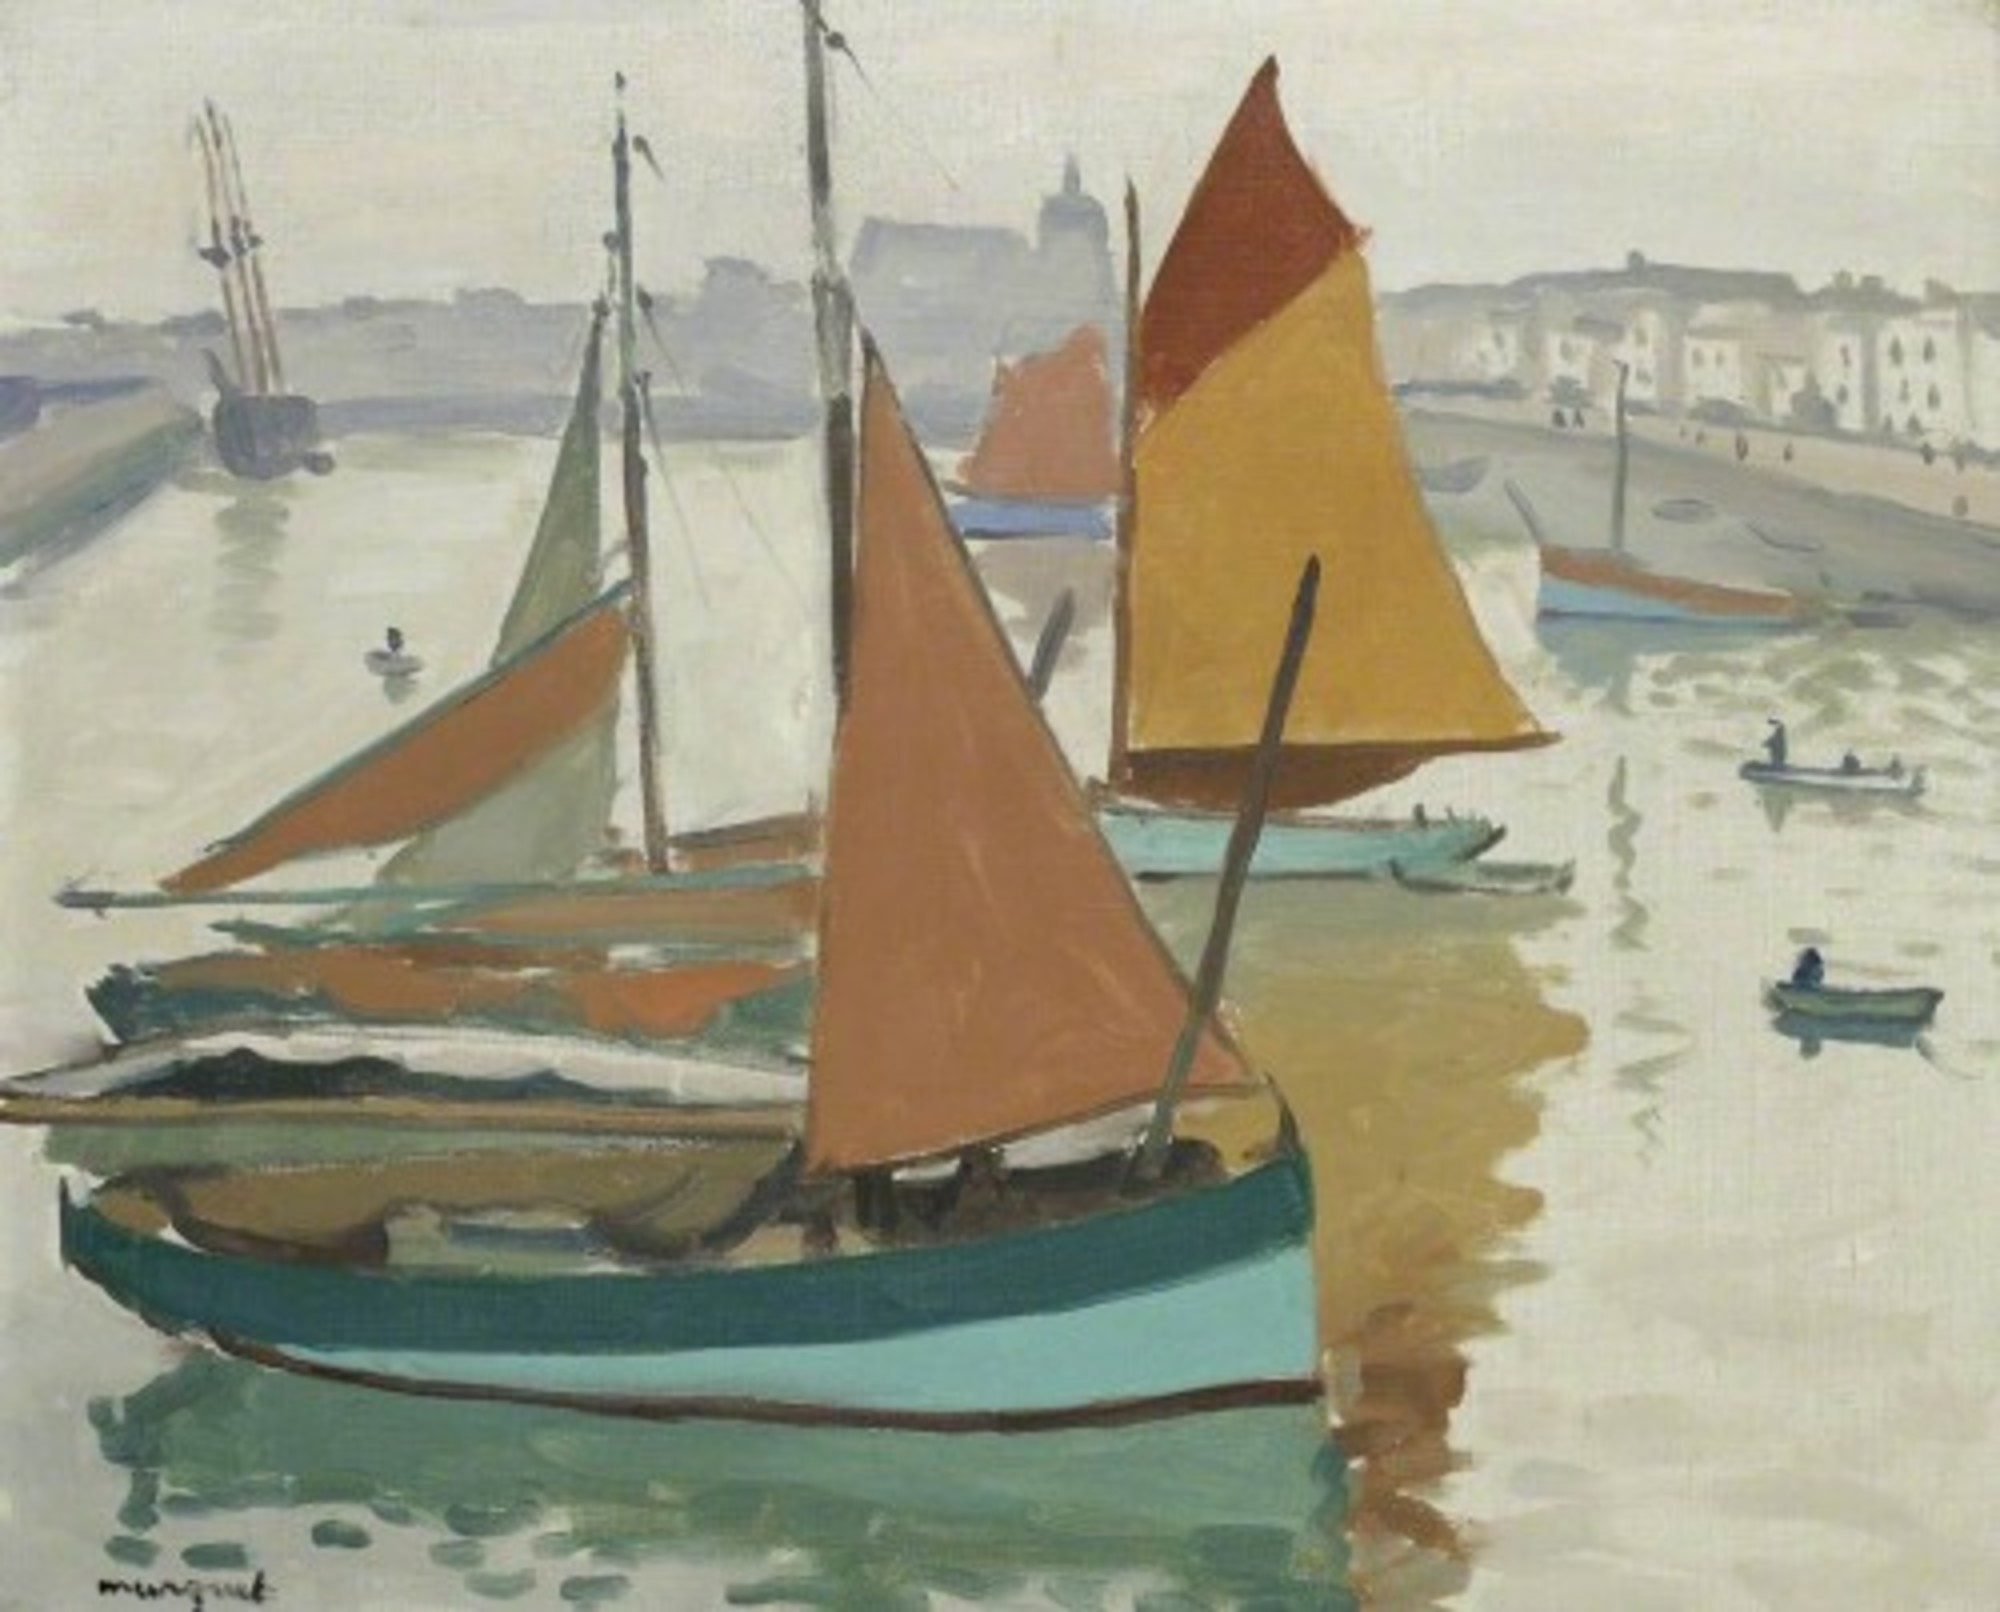 Les-Sables-dOlonne-Albert-Marquet-1921.jpg